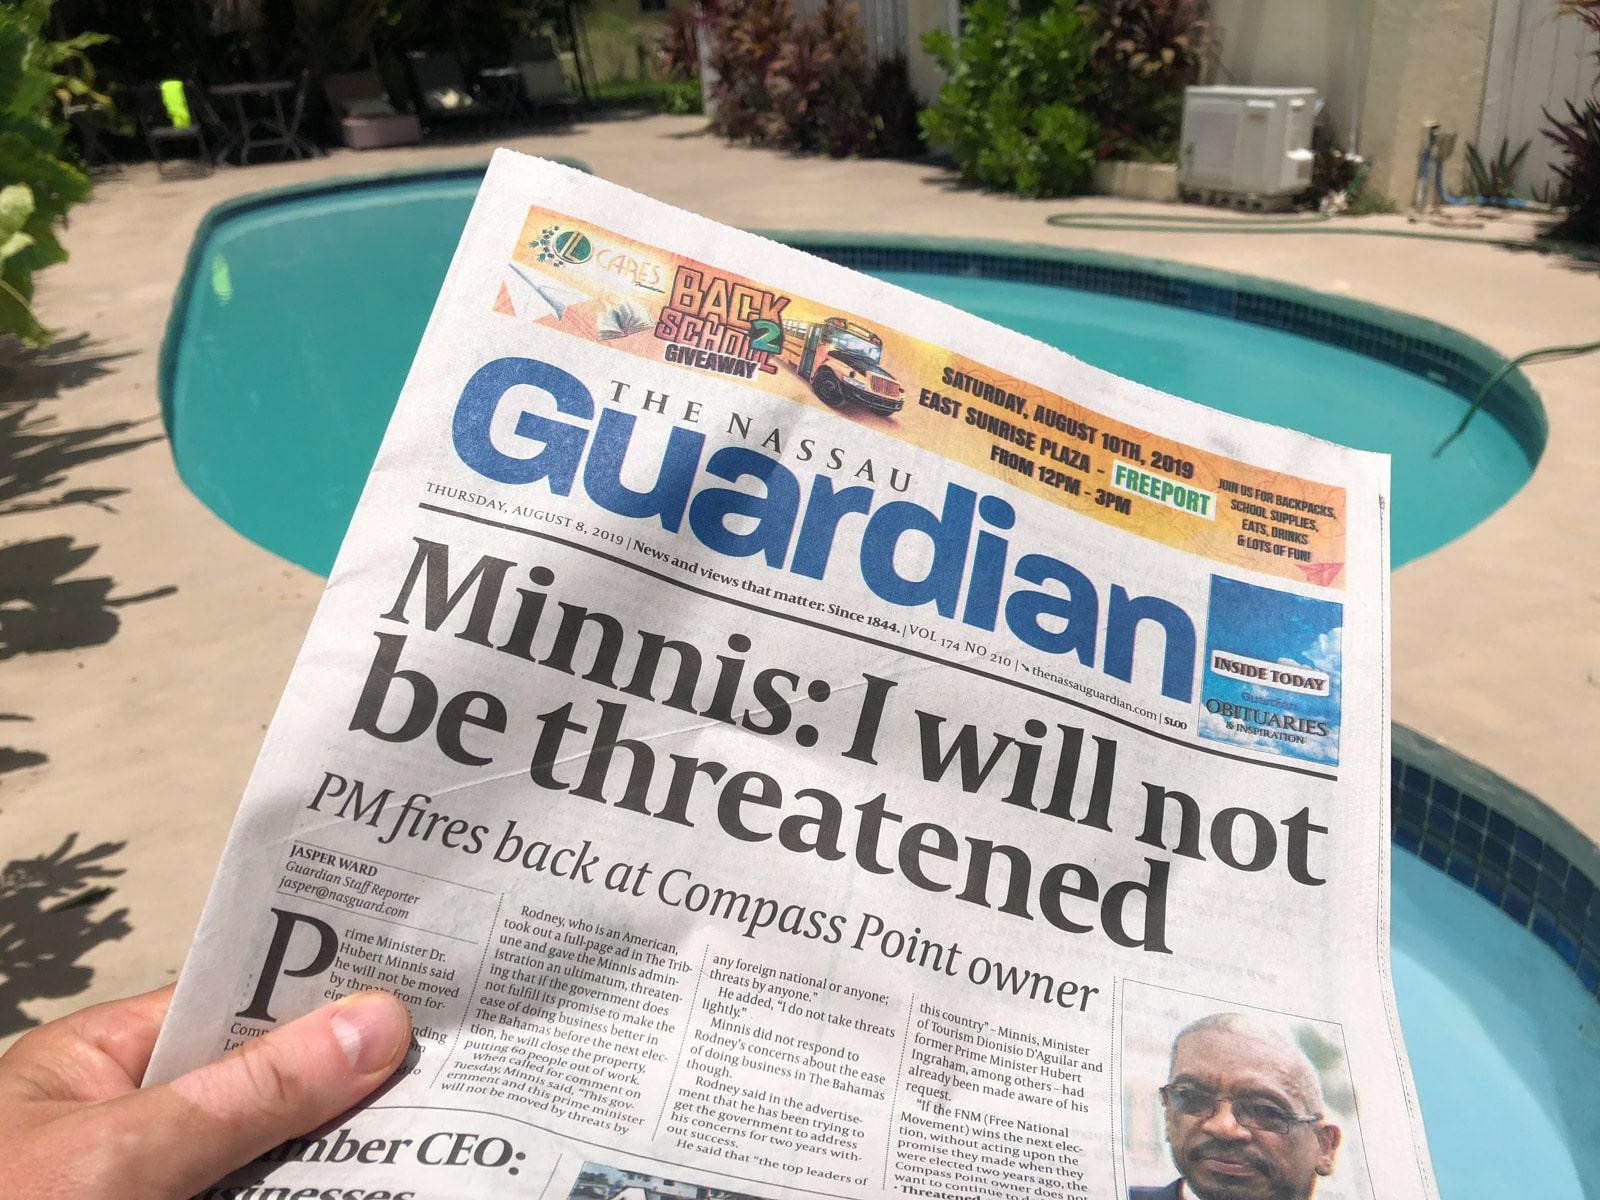 Bahama Guardian